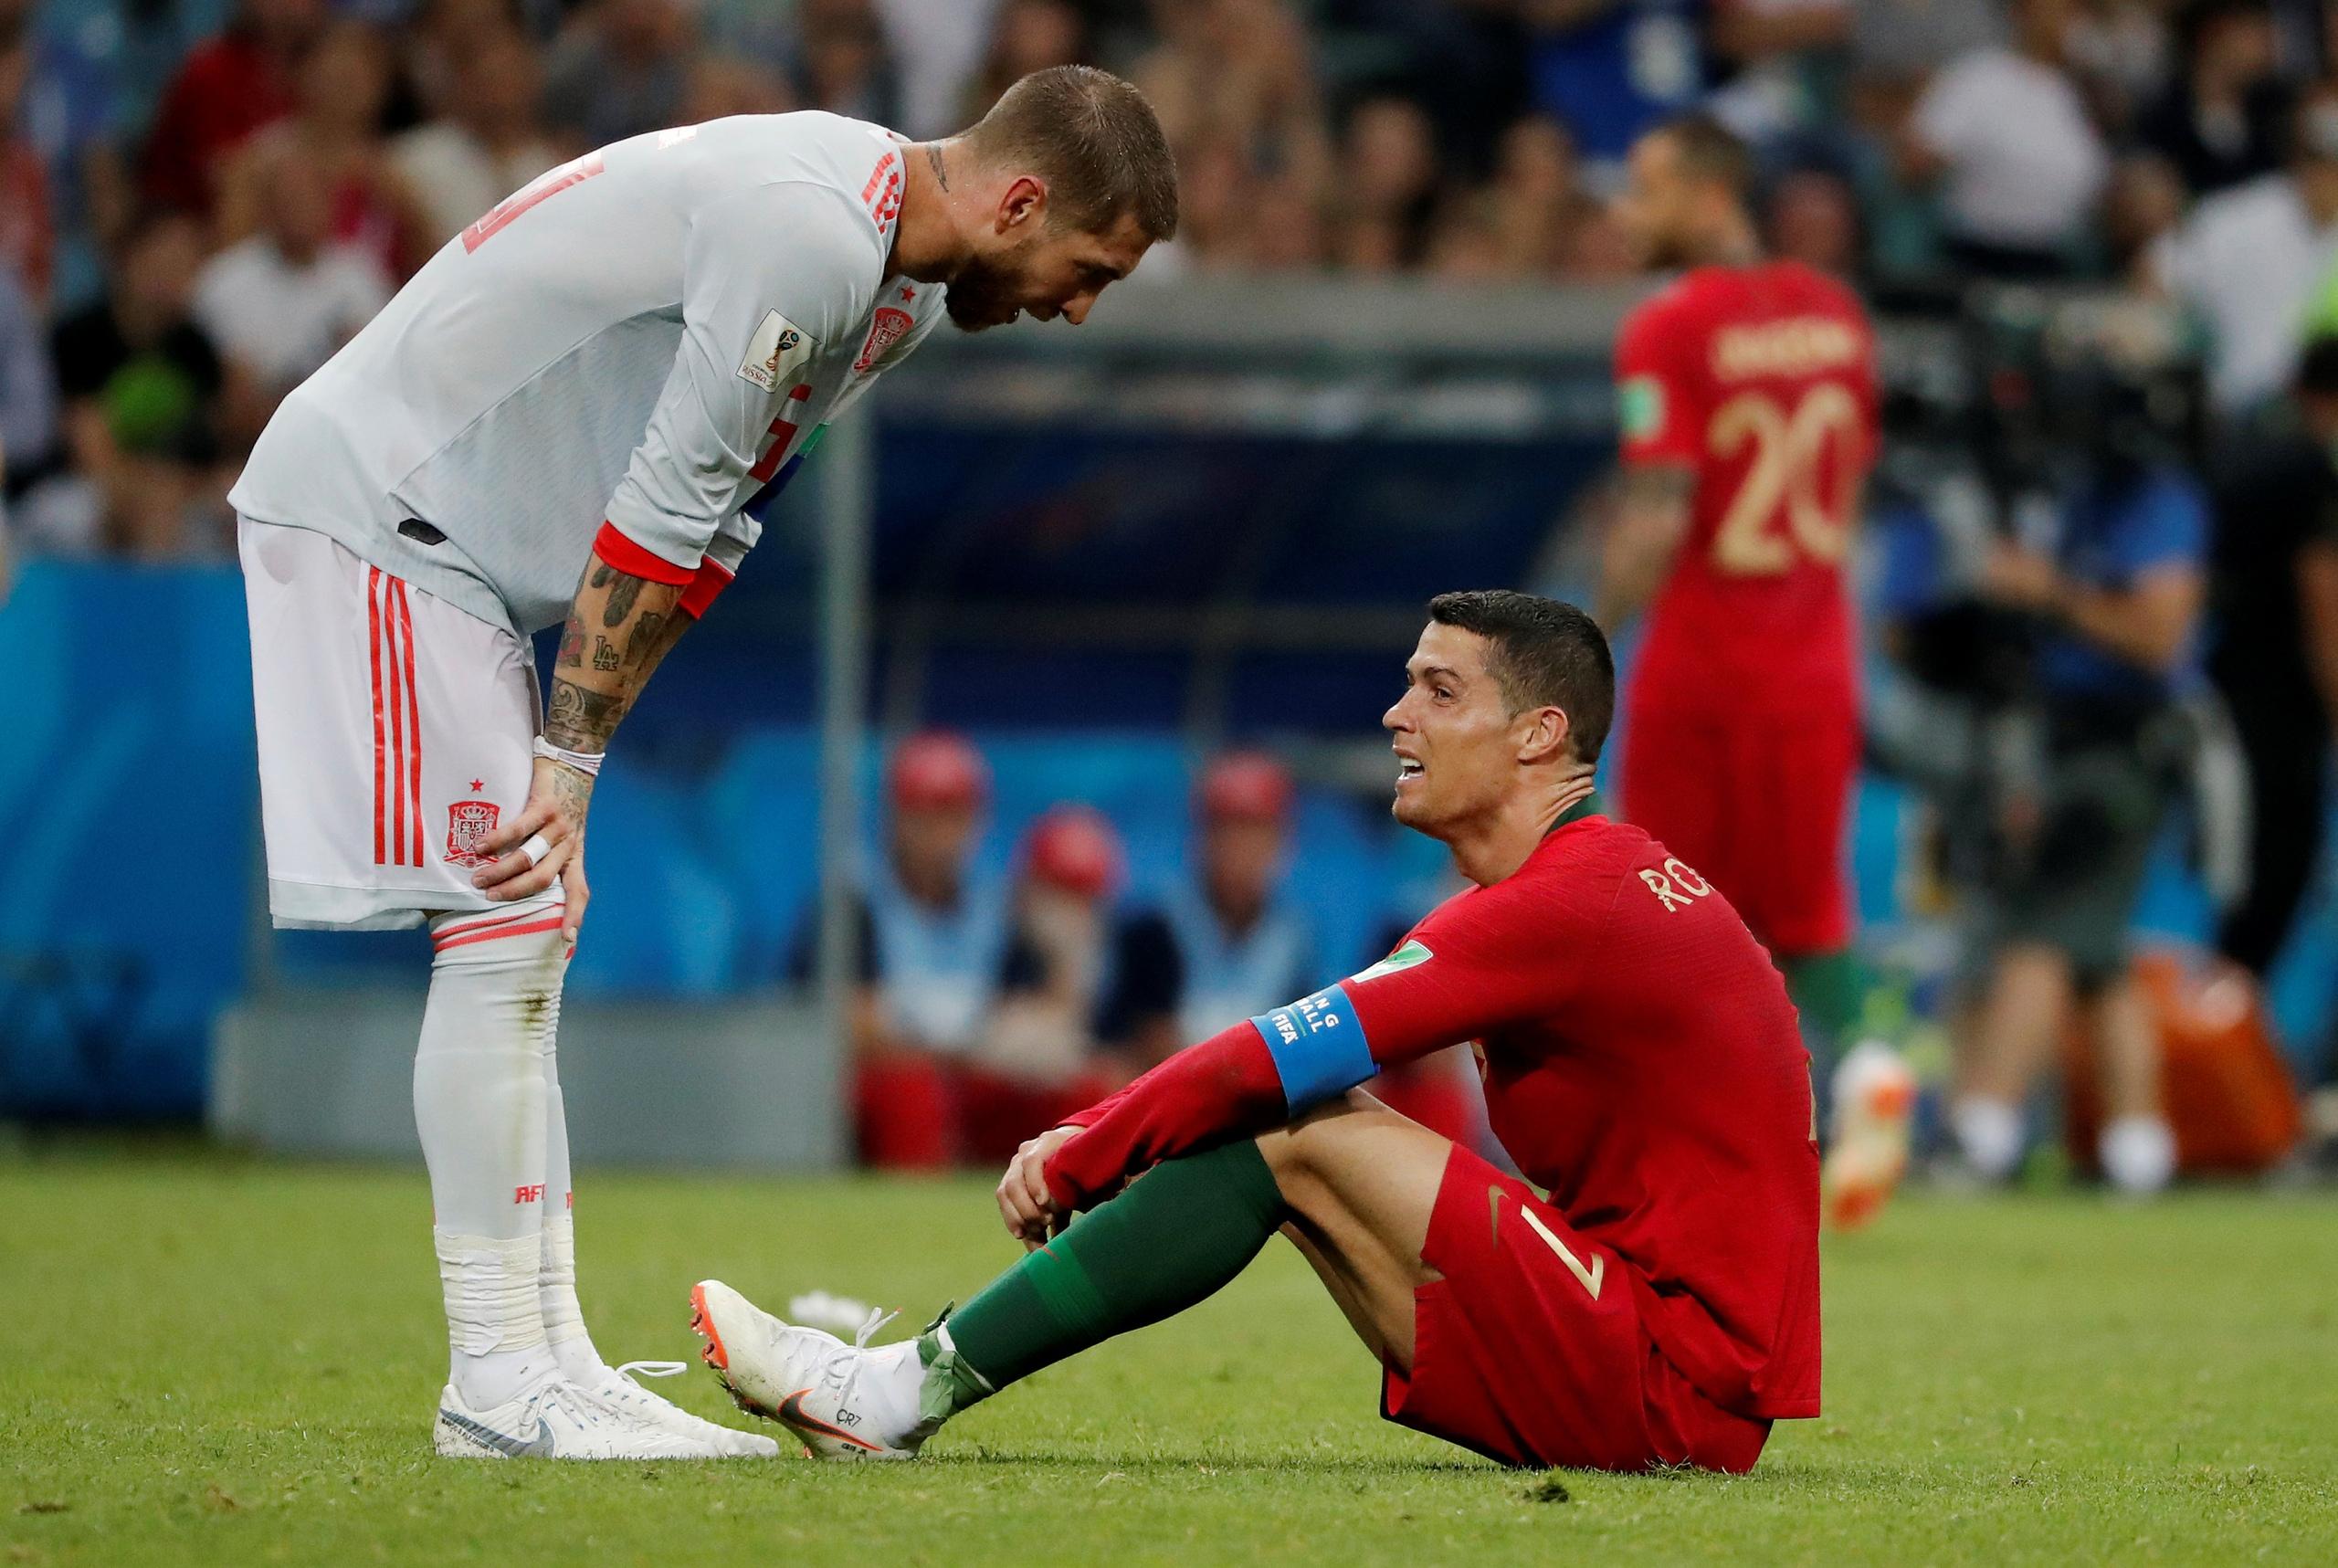 Завершился матч ЧМ-2018 Португалия — Испания